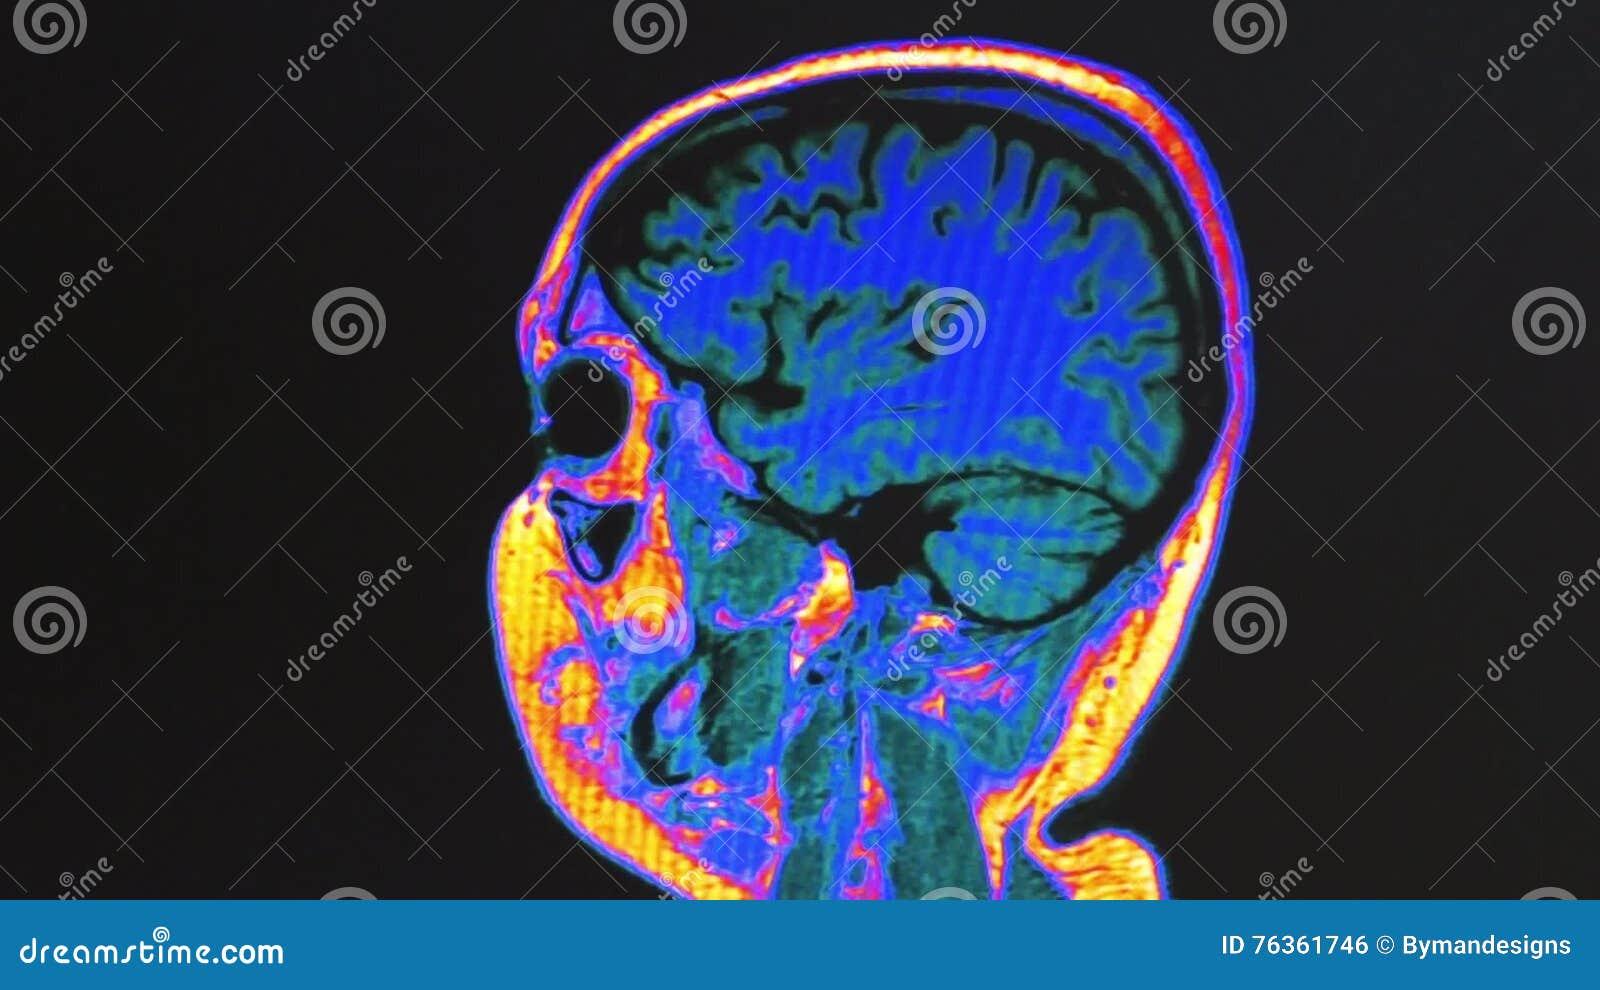 Human brain MRI scan stock footage. Illustration of brain - 76361746